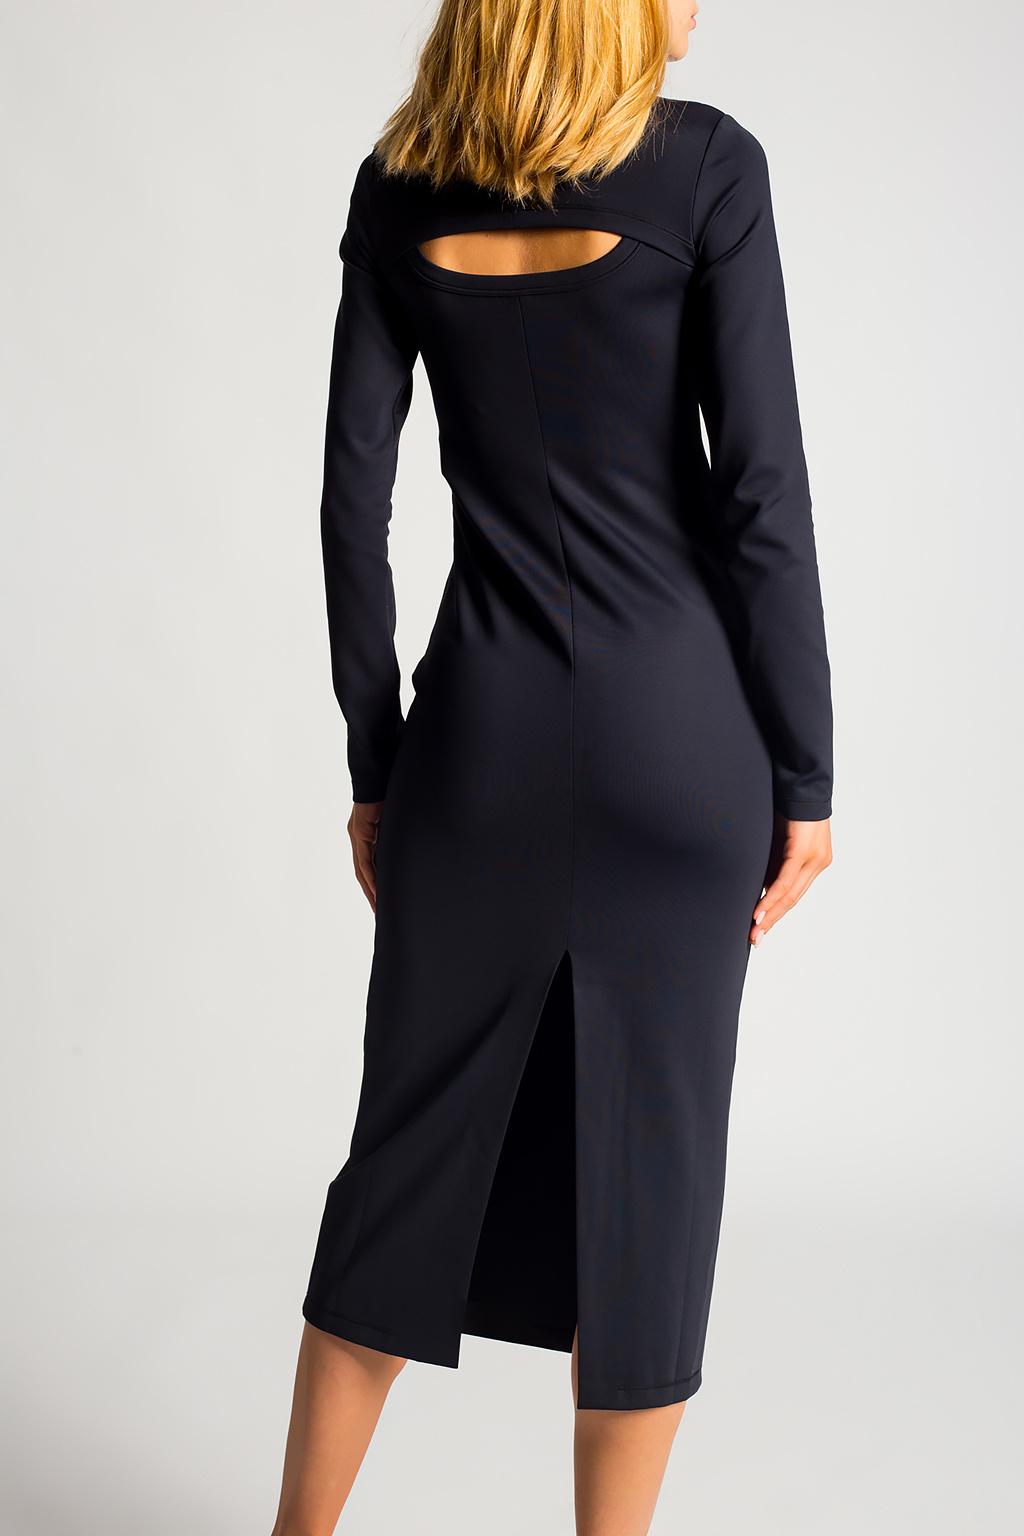 Ambush Dress with standing collar